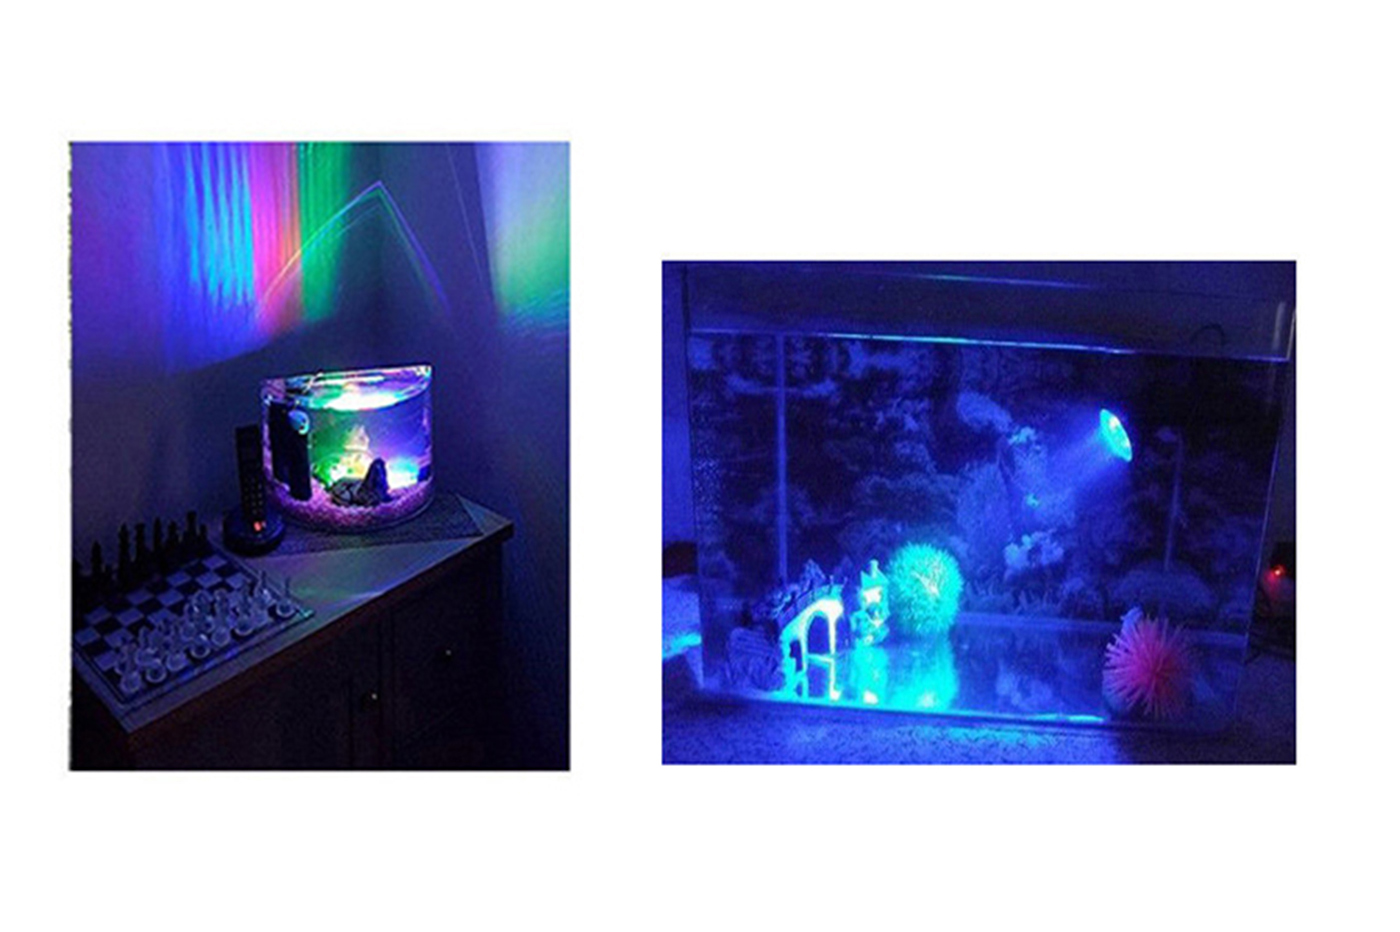 Bes fari beselettronica faro led rgb subacqueo lampada